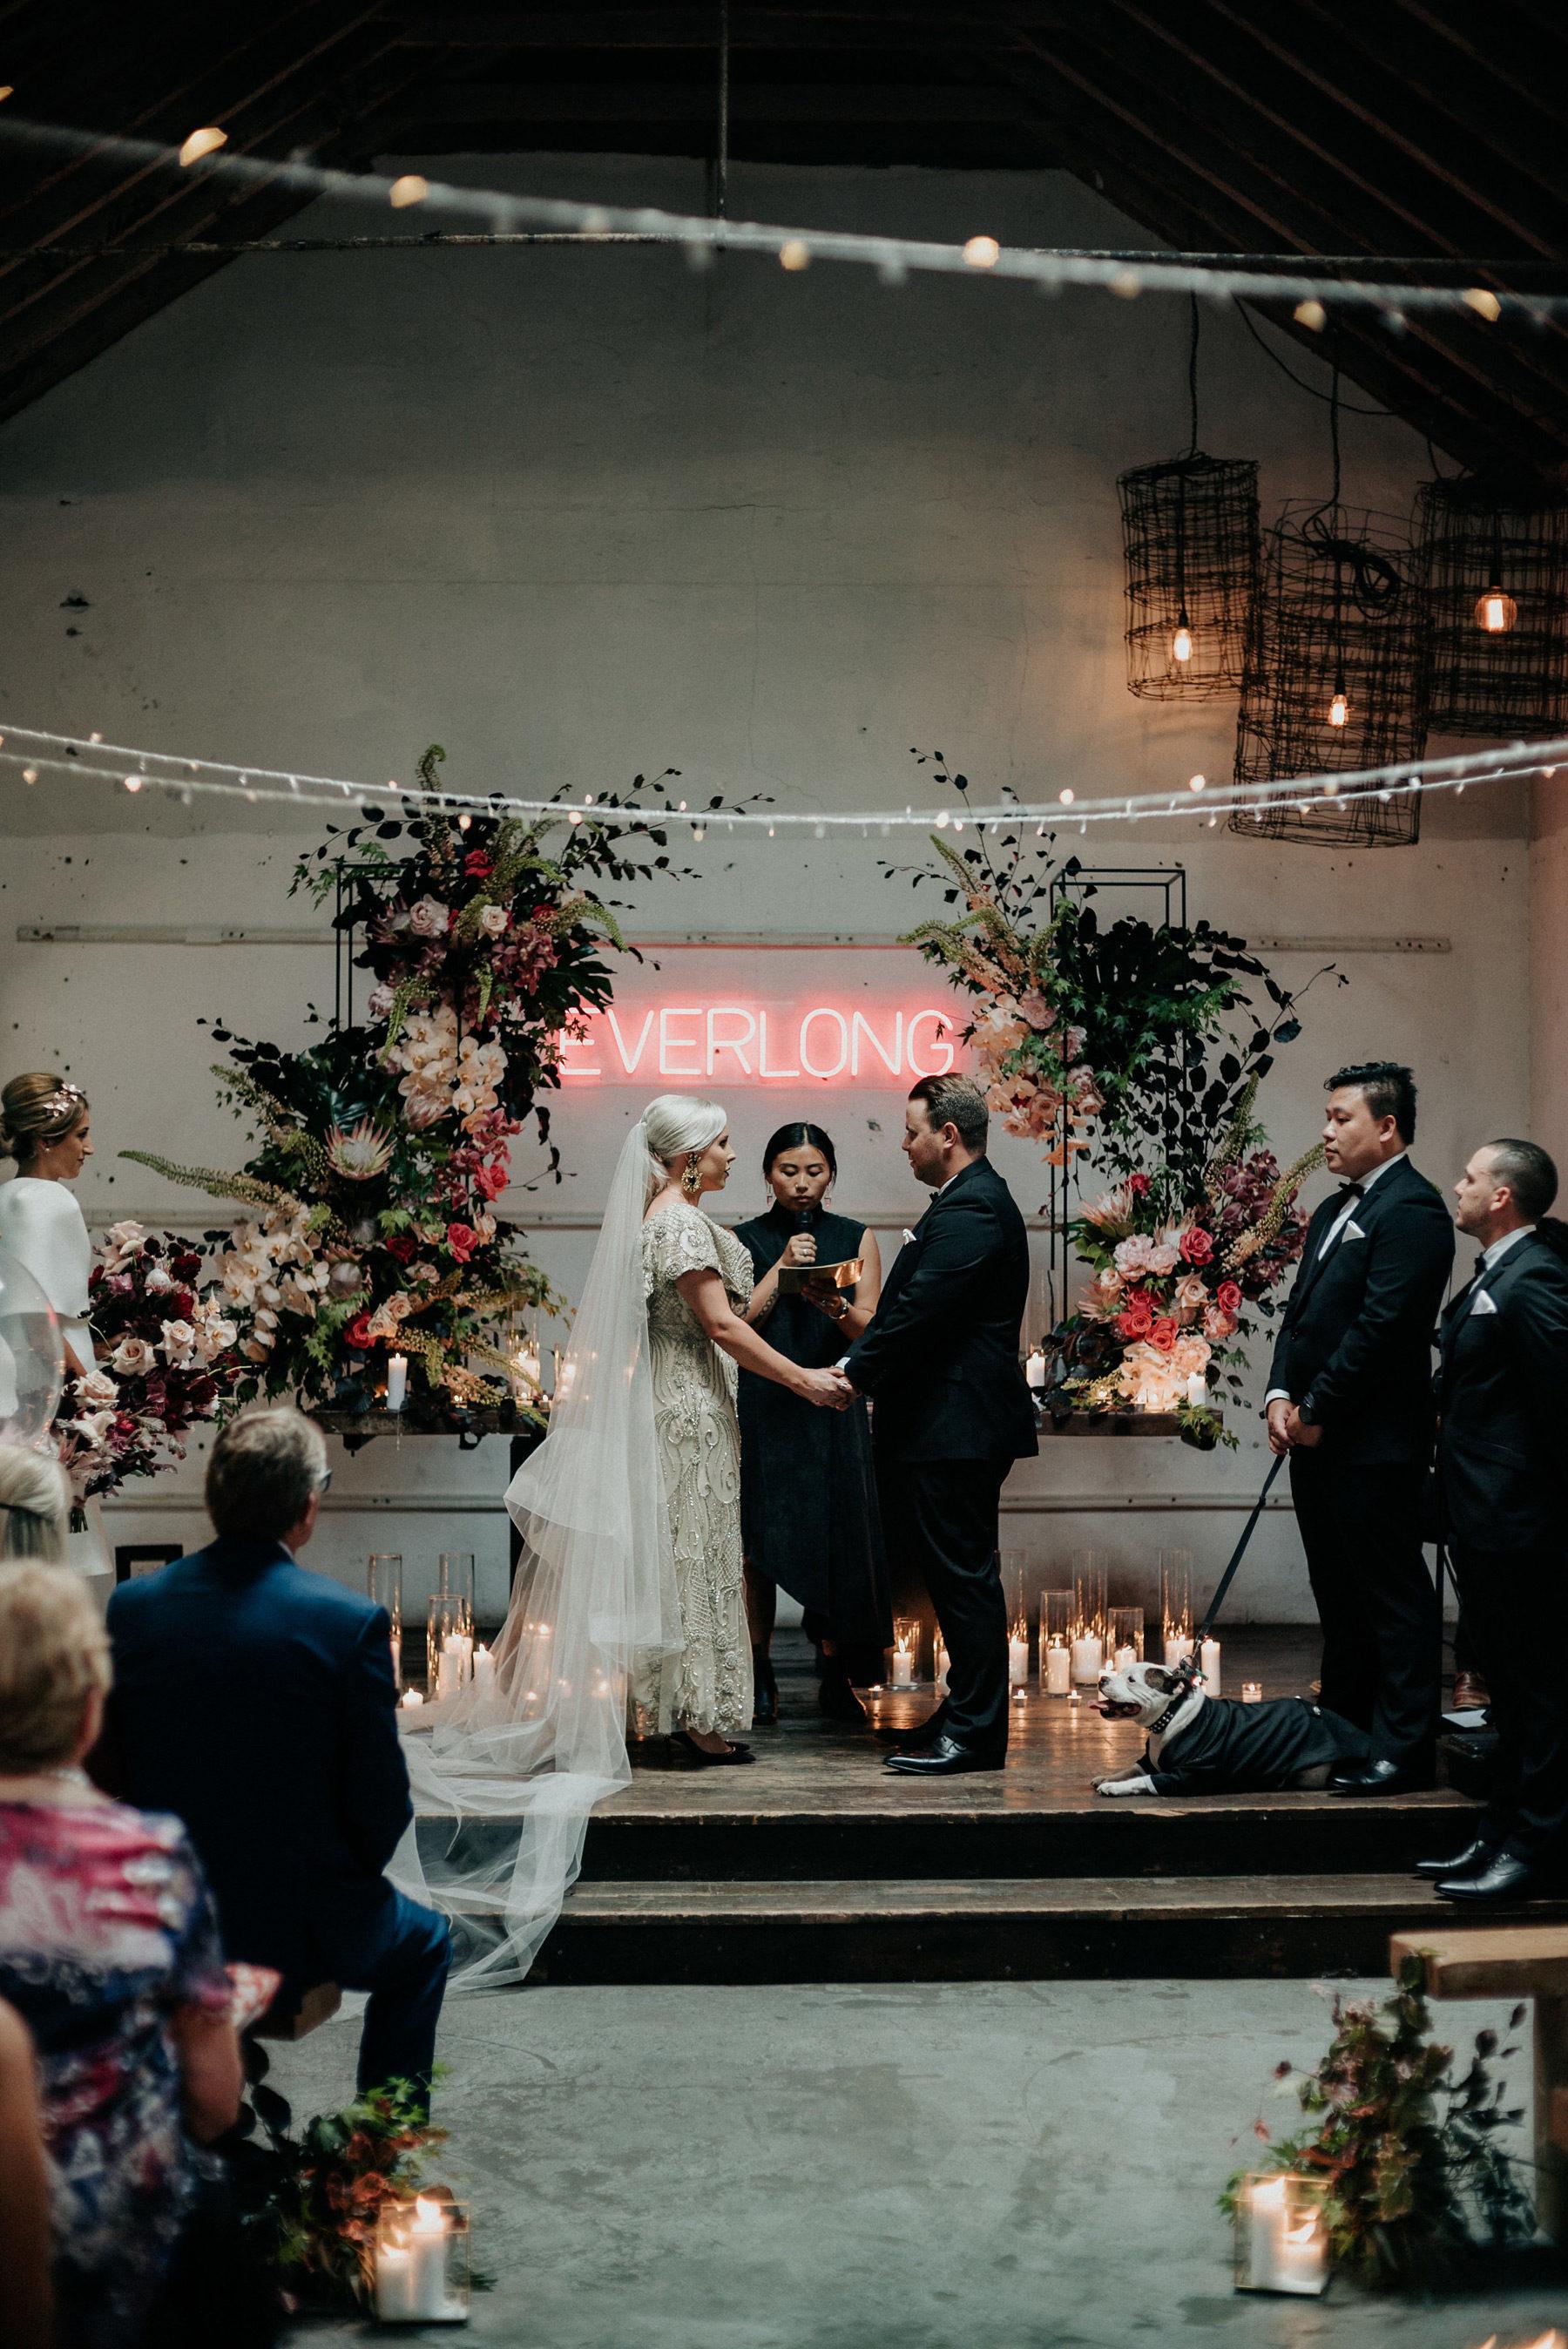 bang-bang-boogaloo-wedding-melbourne-11-1800x0-c-default.jpg